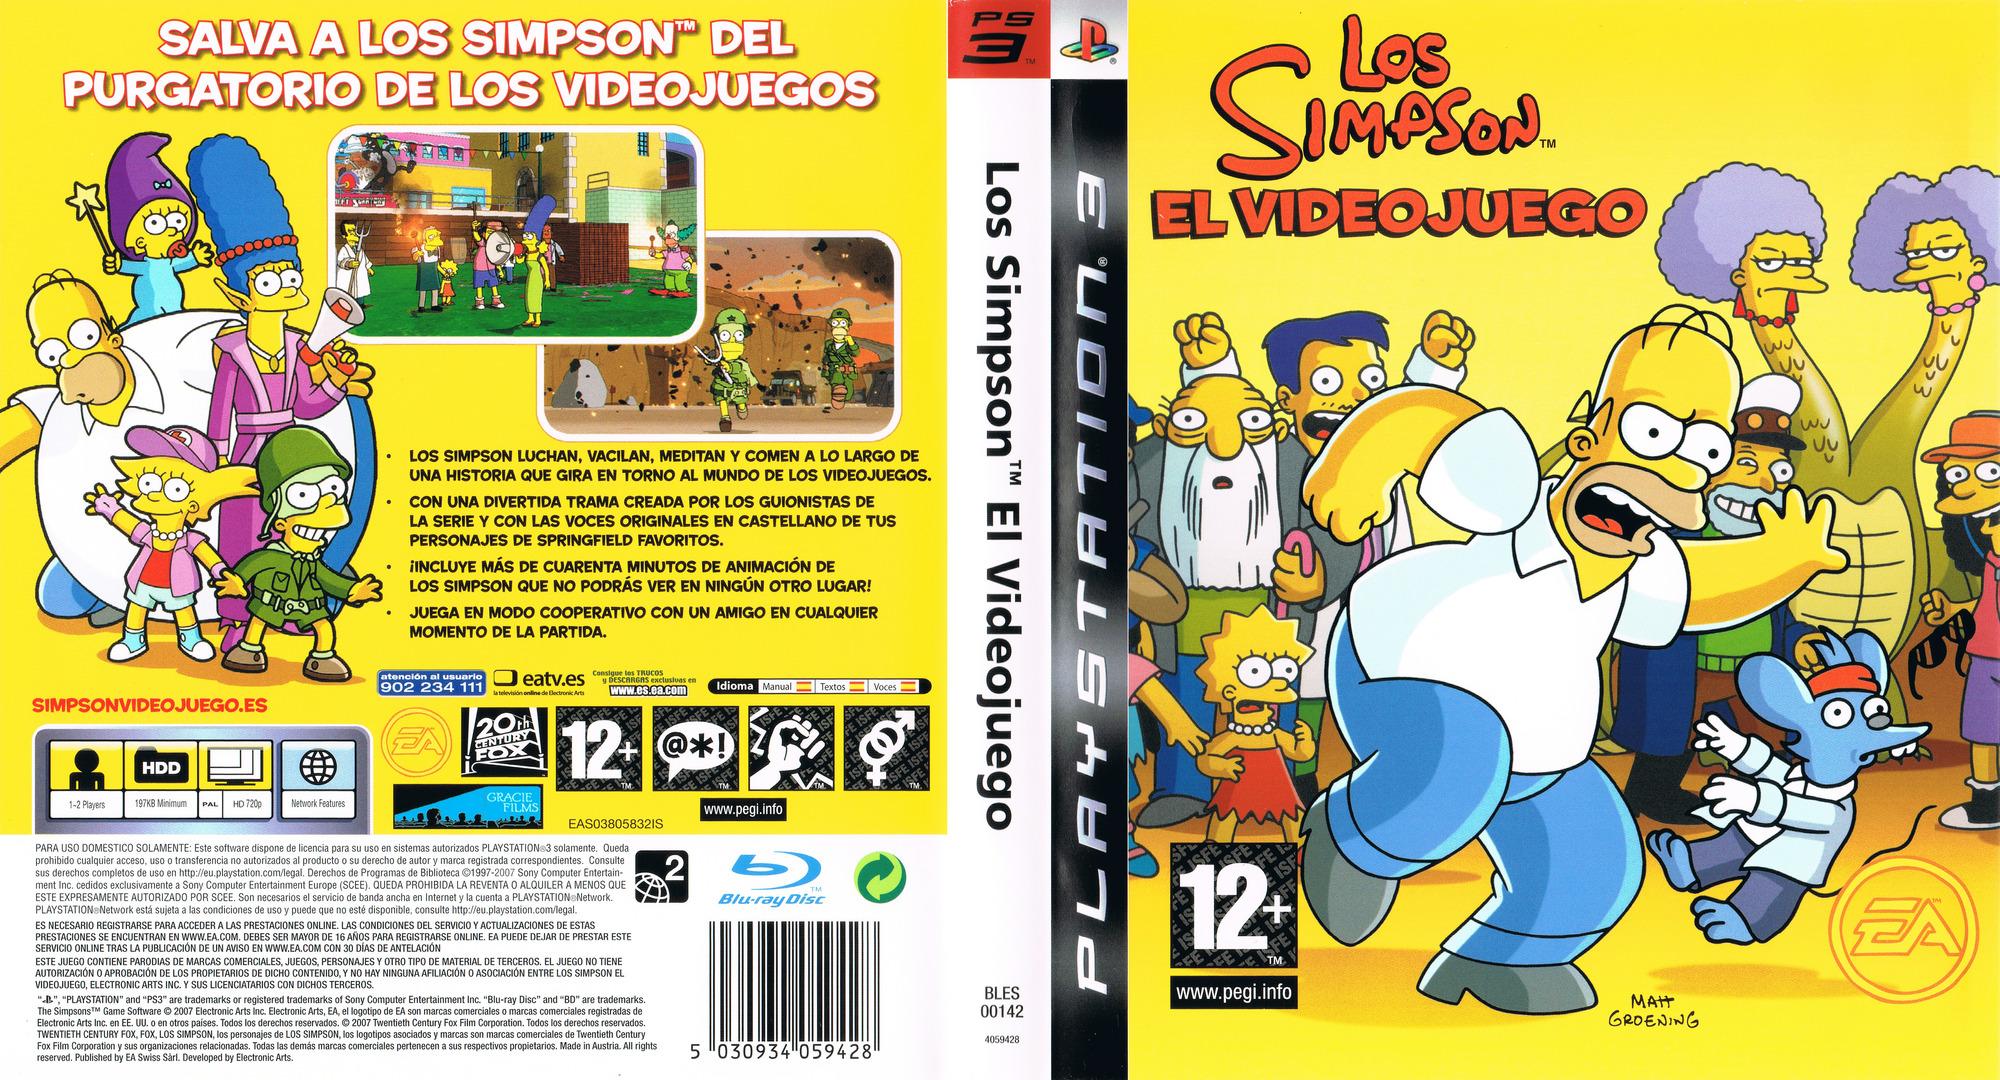 Los Simpsons: El Videojuego PS3 coverfullHQ (BLES00142)